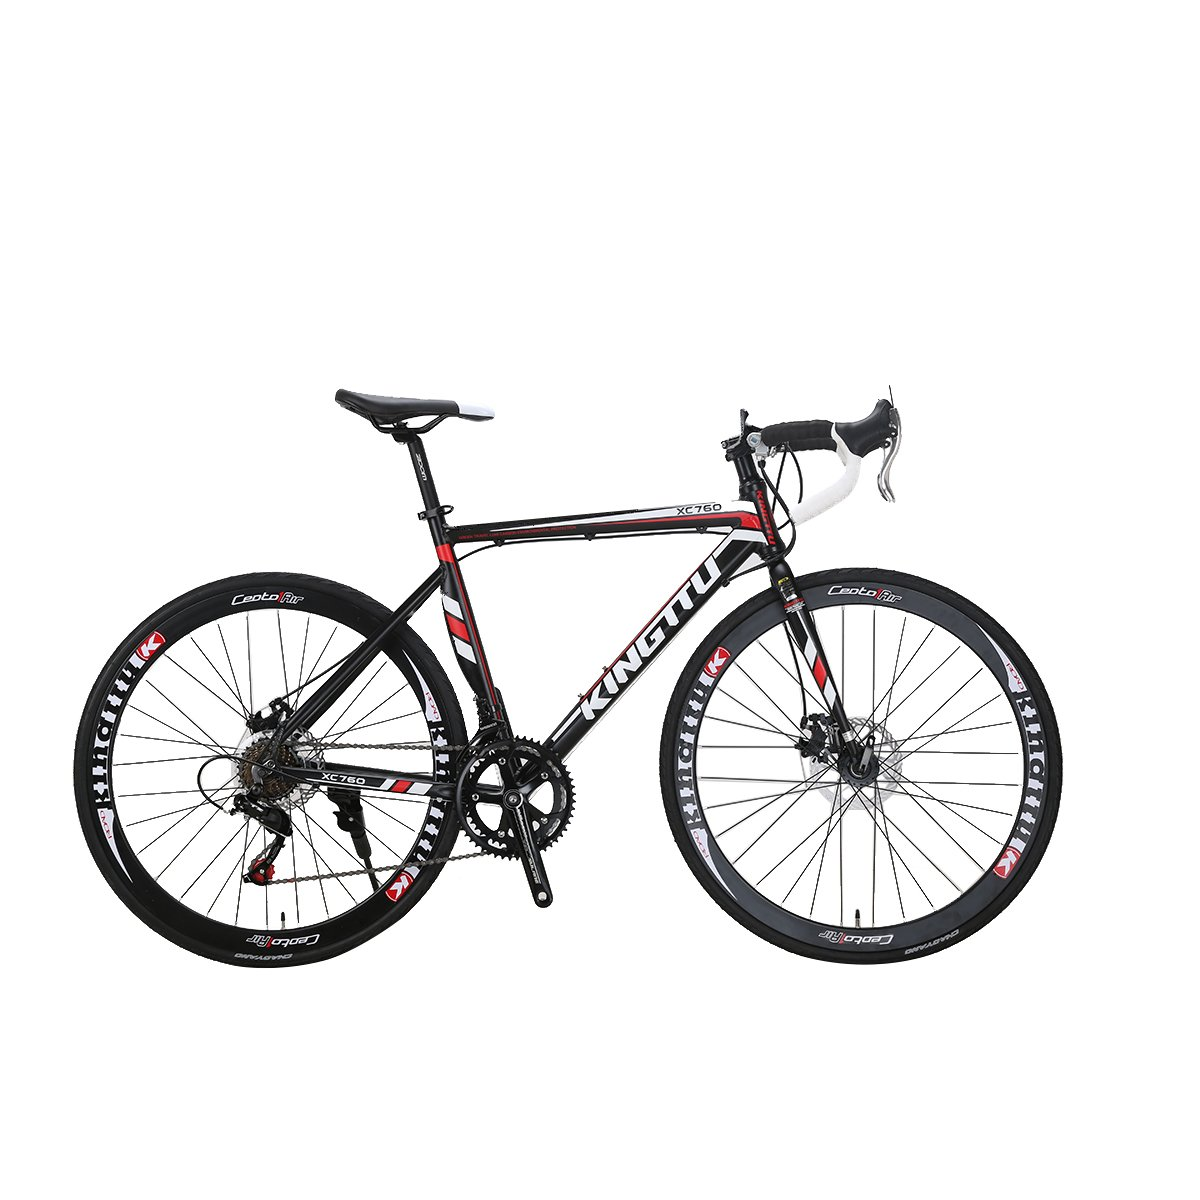 Cyrusher EUROBIKE 自転車 ロードバイク アルミフレーム シマノ14段変速TZ 50 52 700Cディスクブレーキ軽量 通勤 通学 街乗り B073F9FXRDブラック